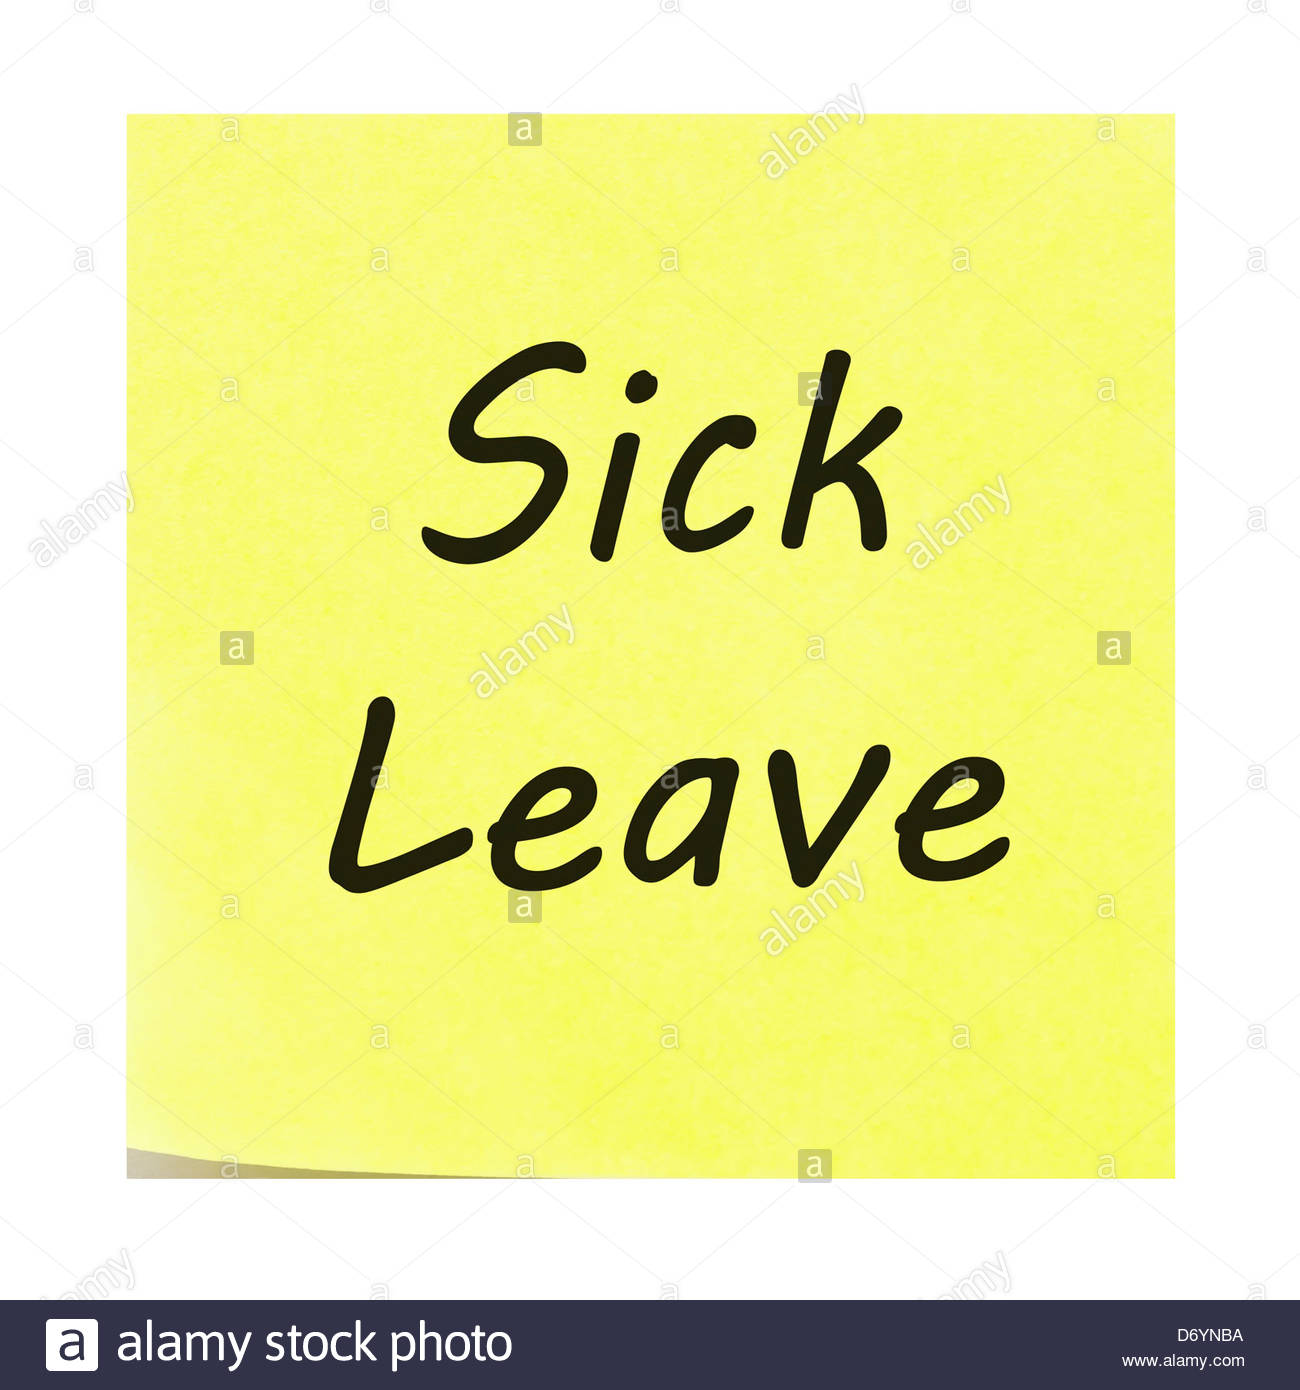 Sick Leave Stockfotos & Sick Leave Bilder - Alamy